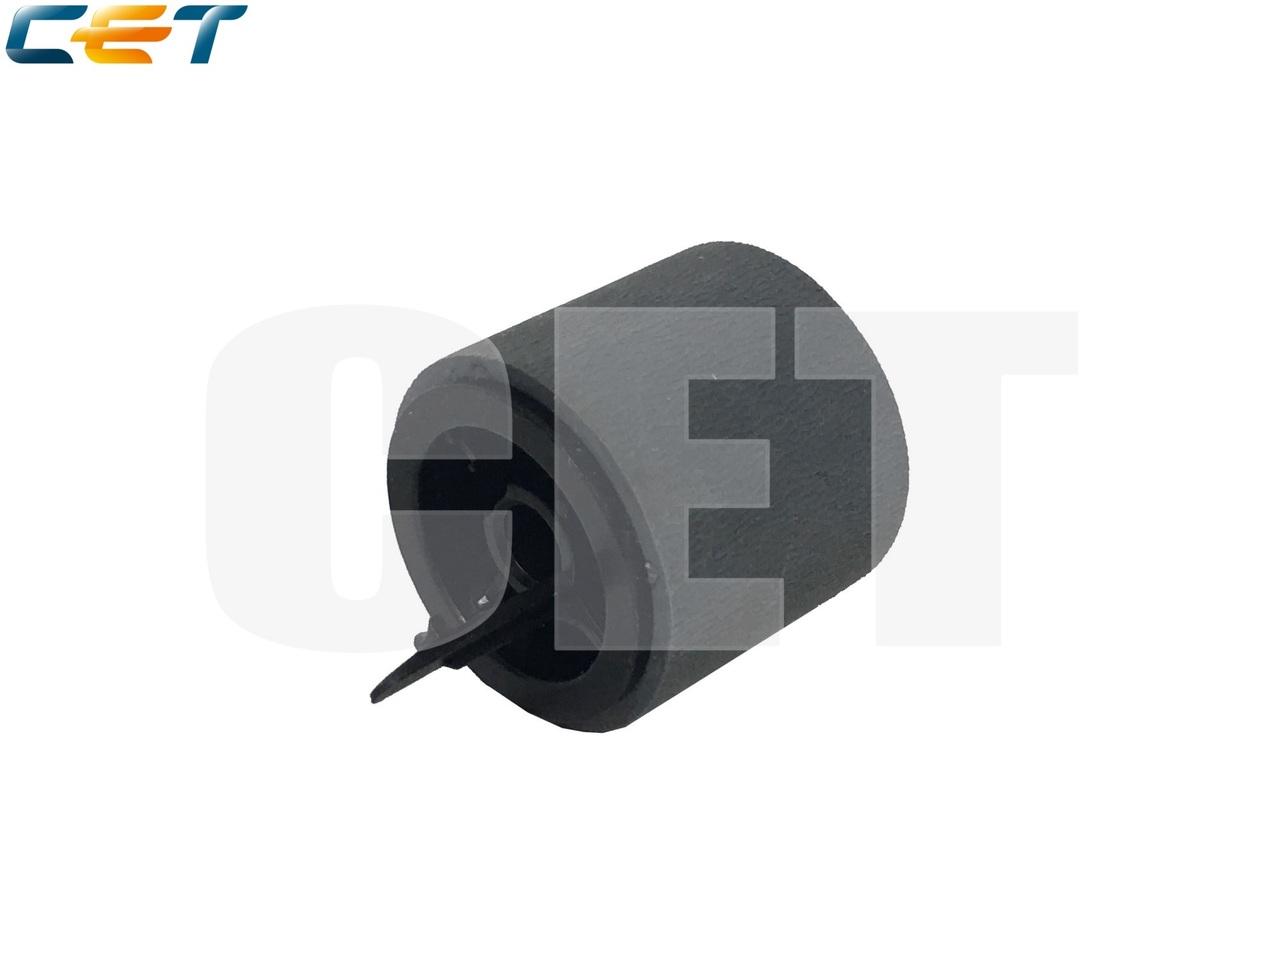 Ролик подхвата JC93-00310A для SAMSUNGML-3200/3310/3700 (CET), DGP7491